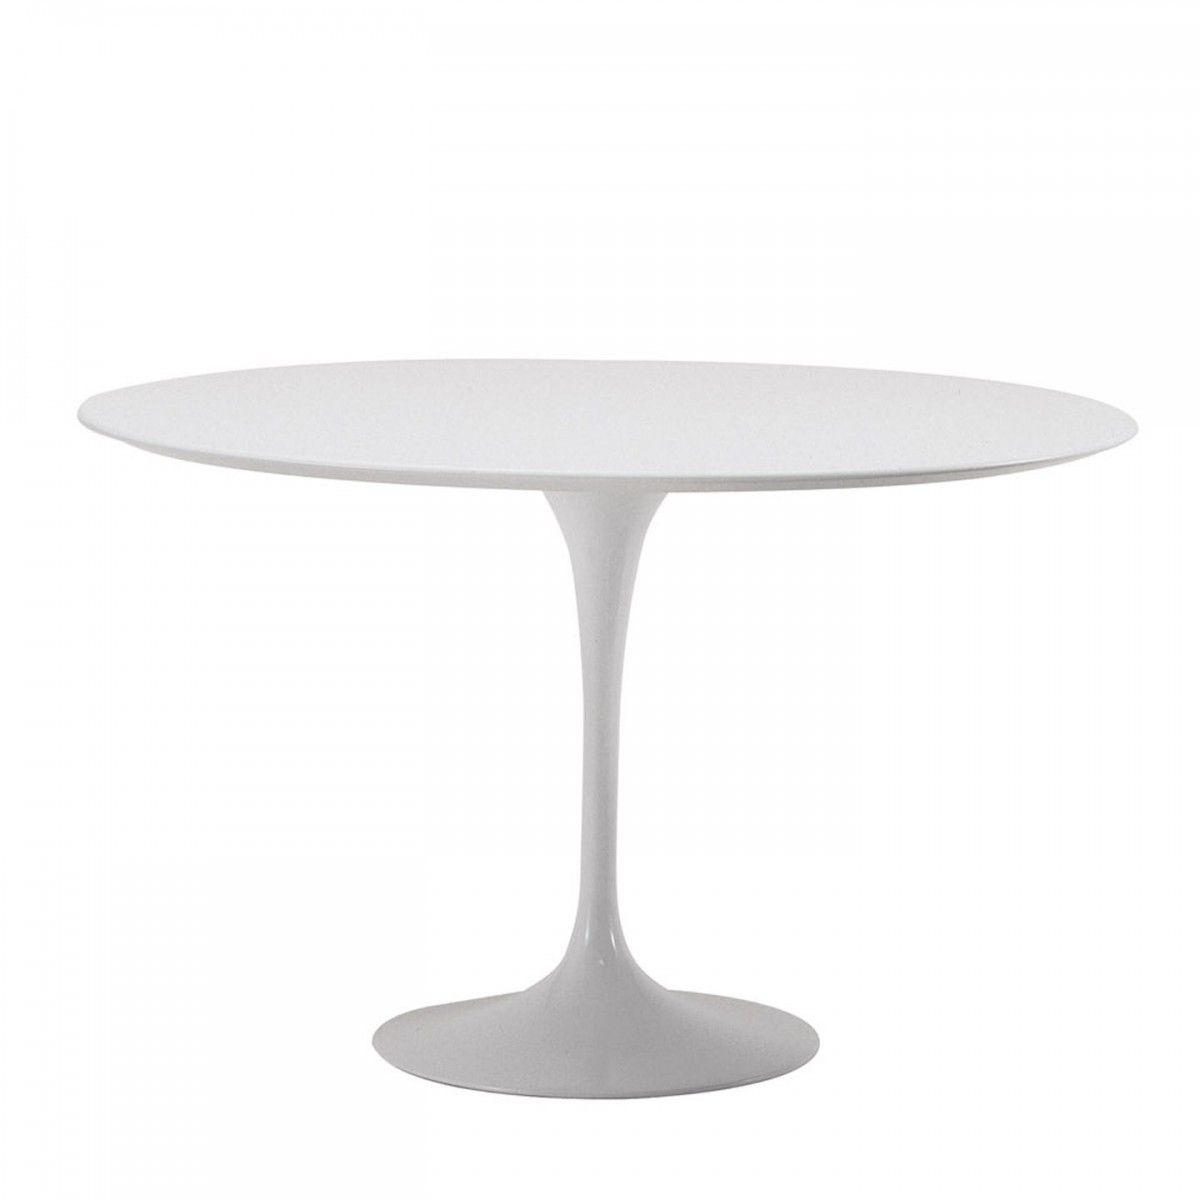 Saarinen Outdoor Round Table Saarinen Dining Table Saarinen Table Dining Table [ 1200 x 1200 Pixel ]